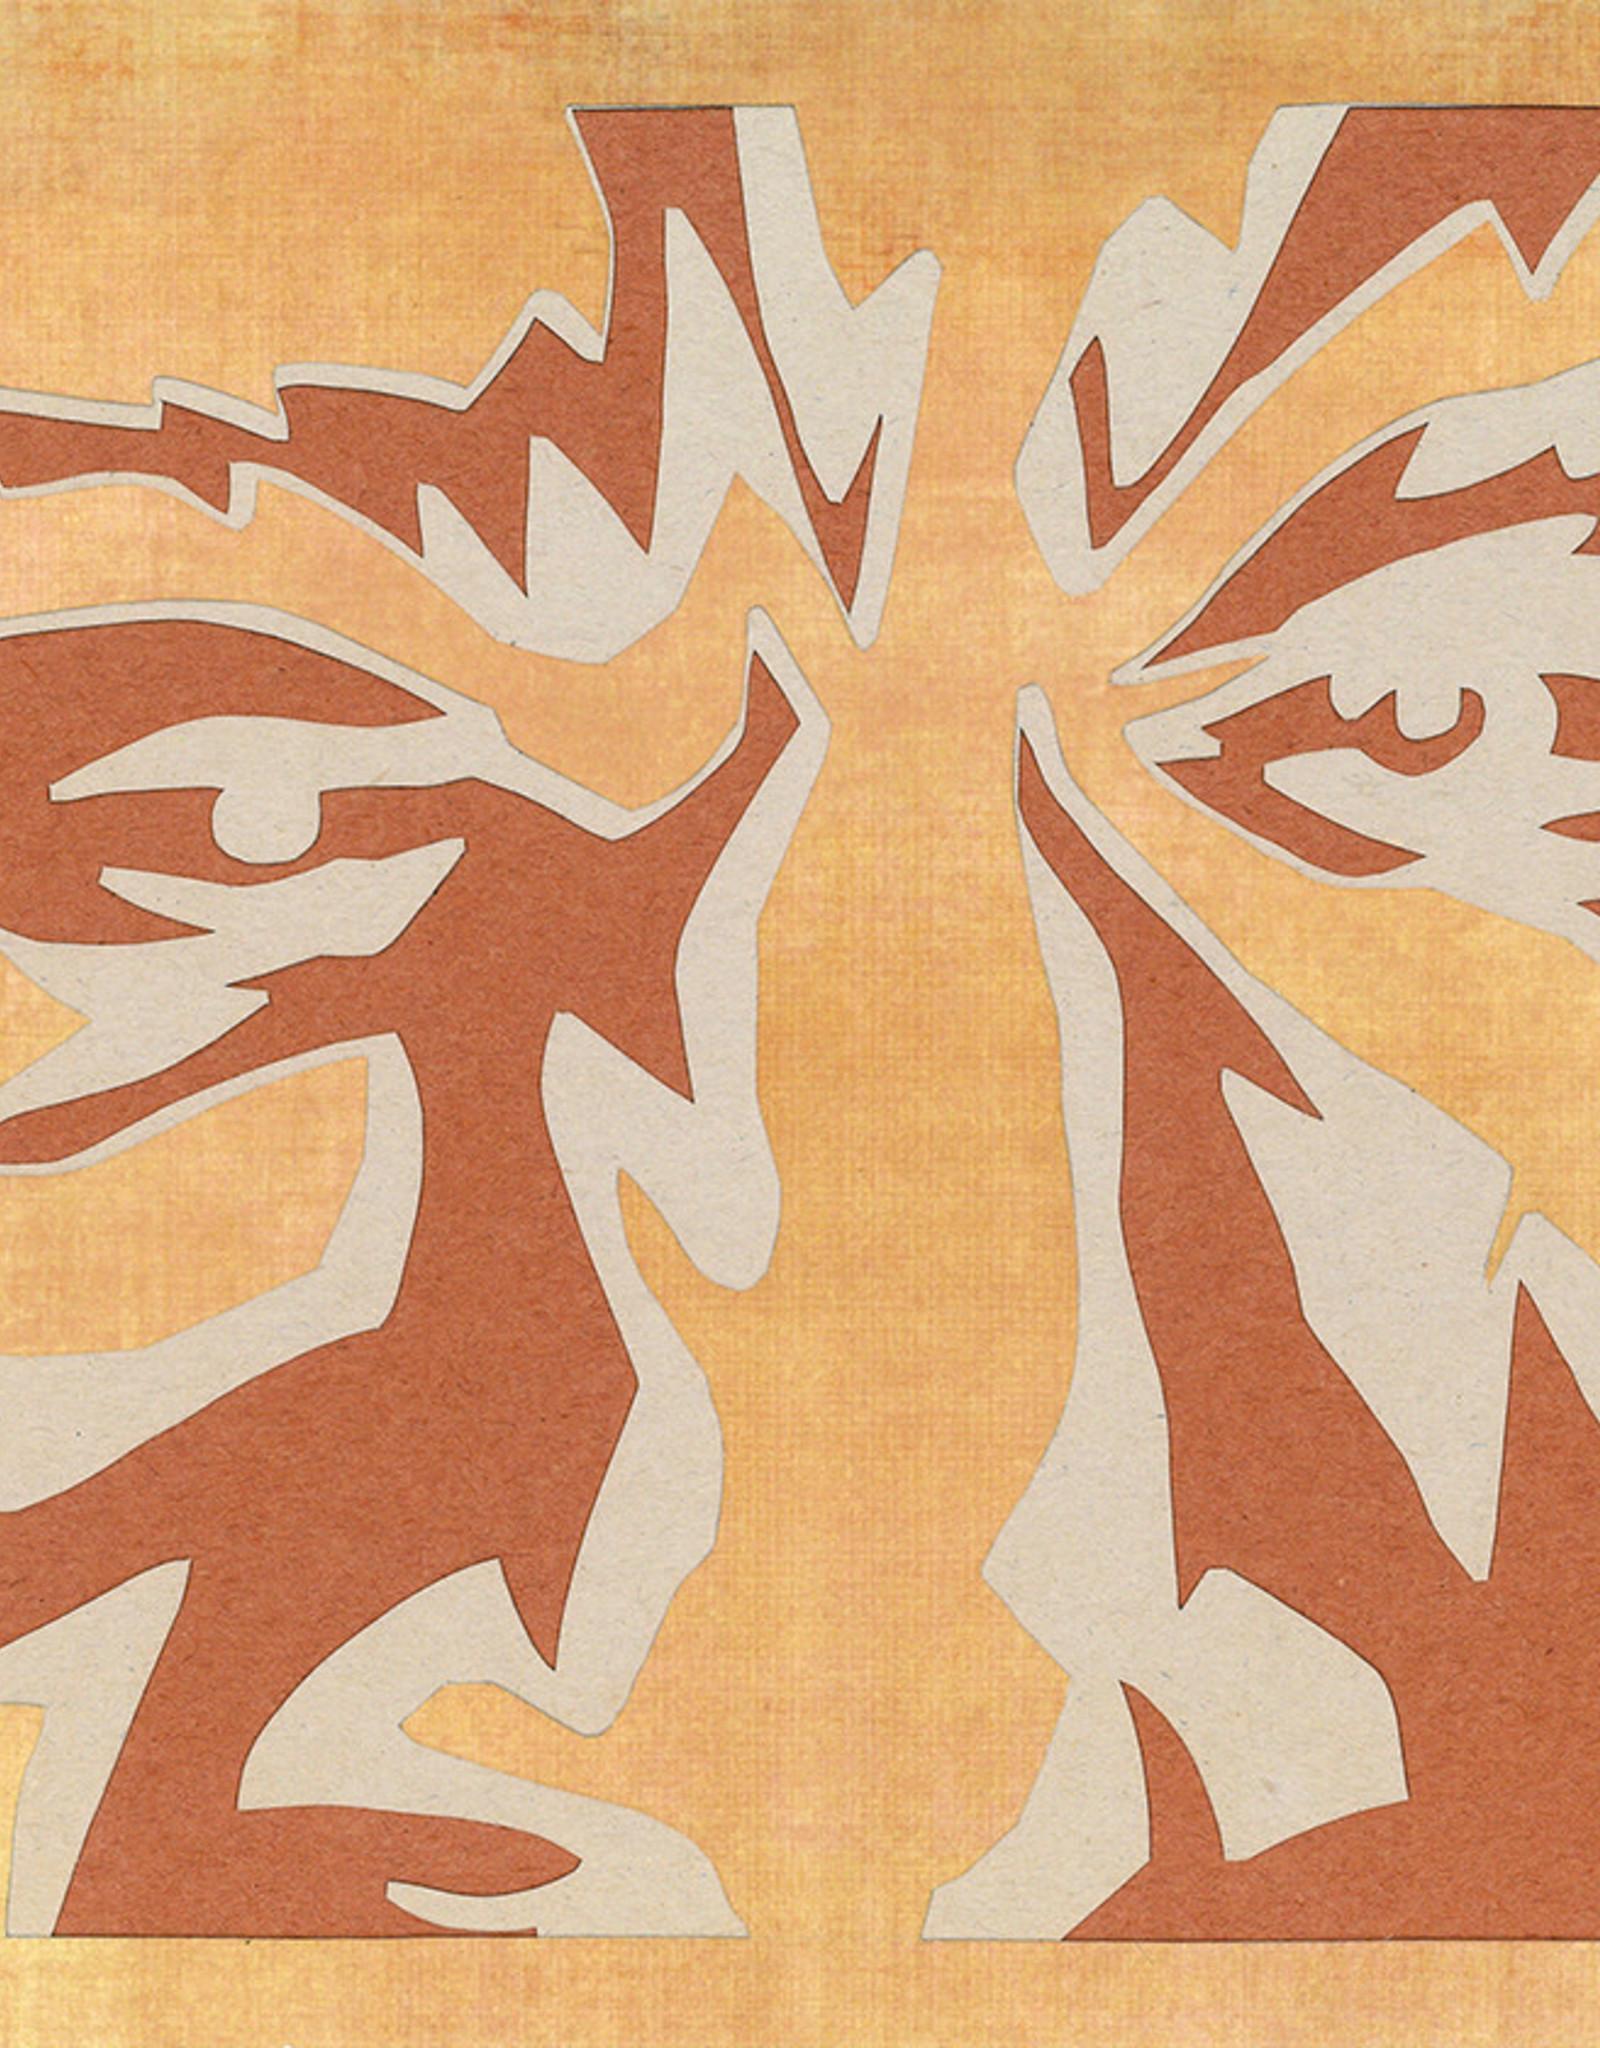 Gray Jones Face to Face -Cutout 9x12 #13